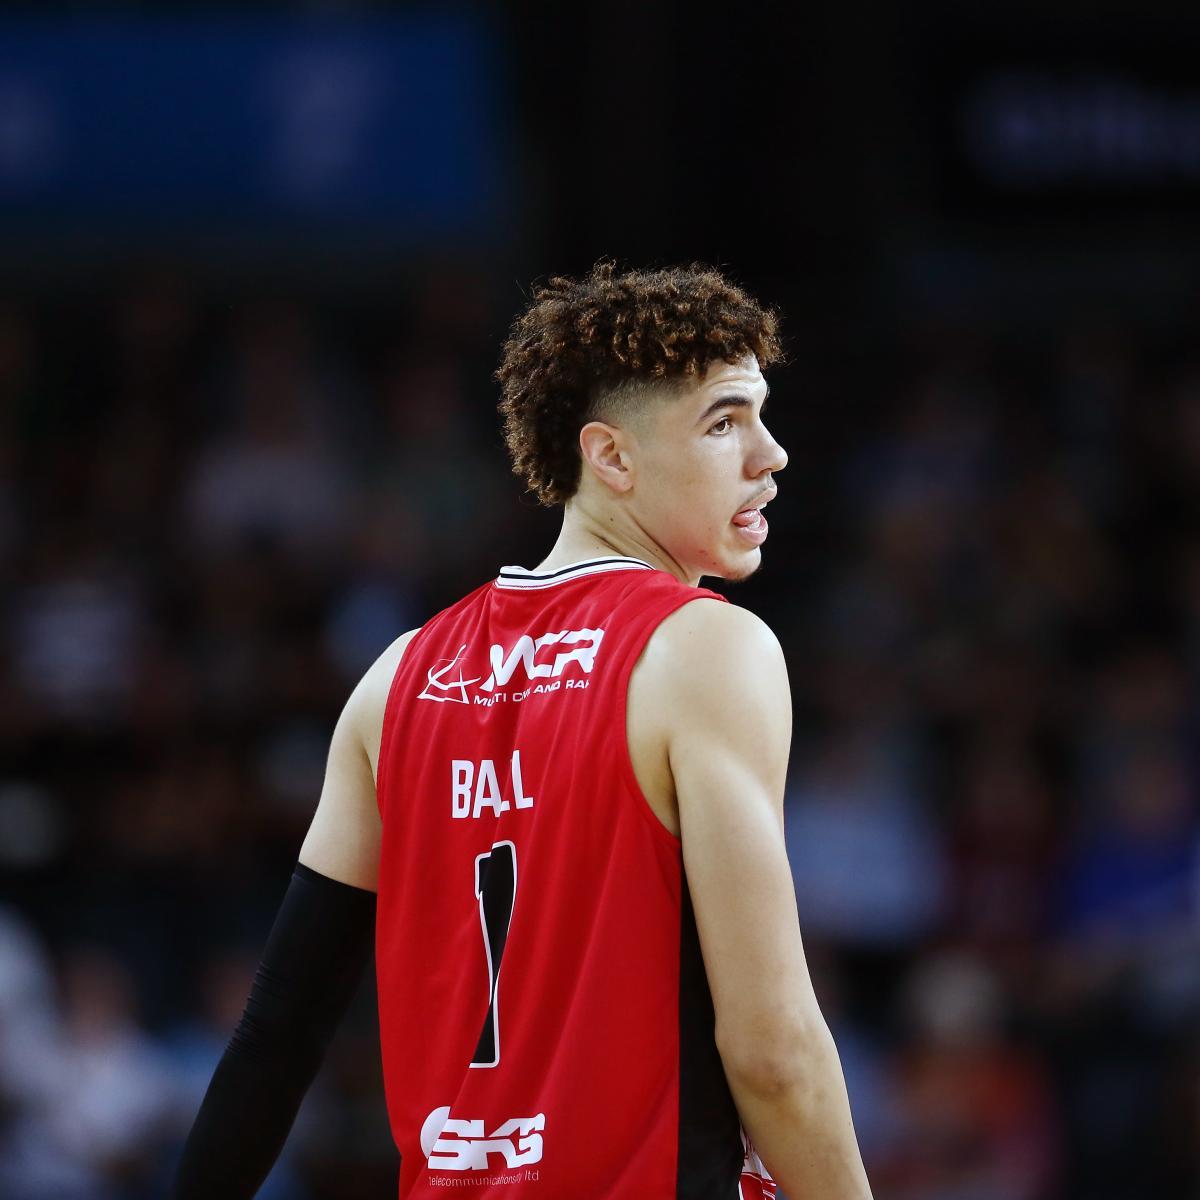 2020 NBA Mock Draft: Predicting Landing Spots for LaMelo Ball, Top Prospects